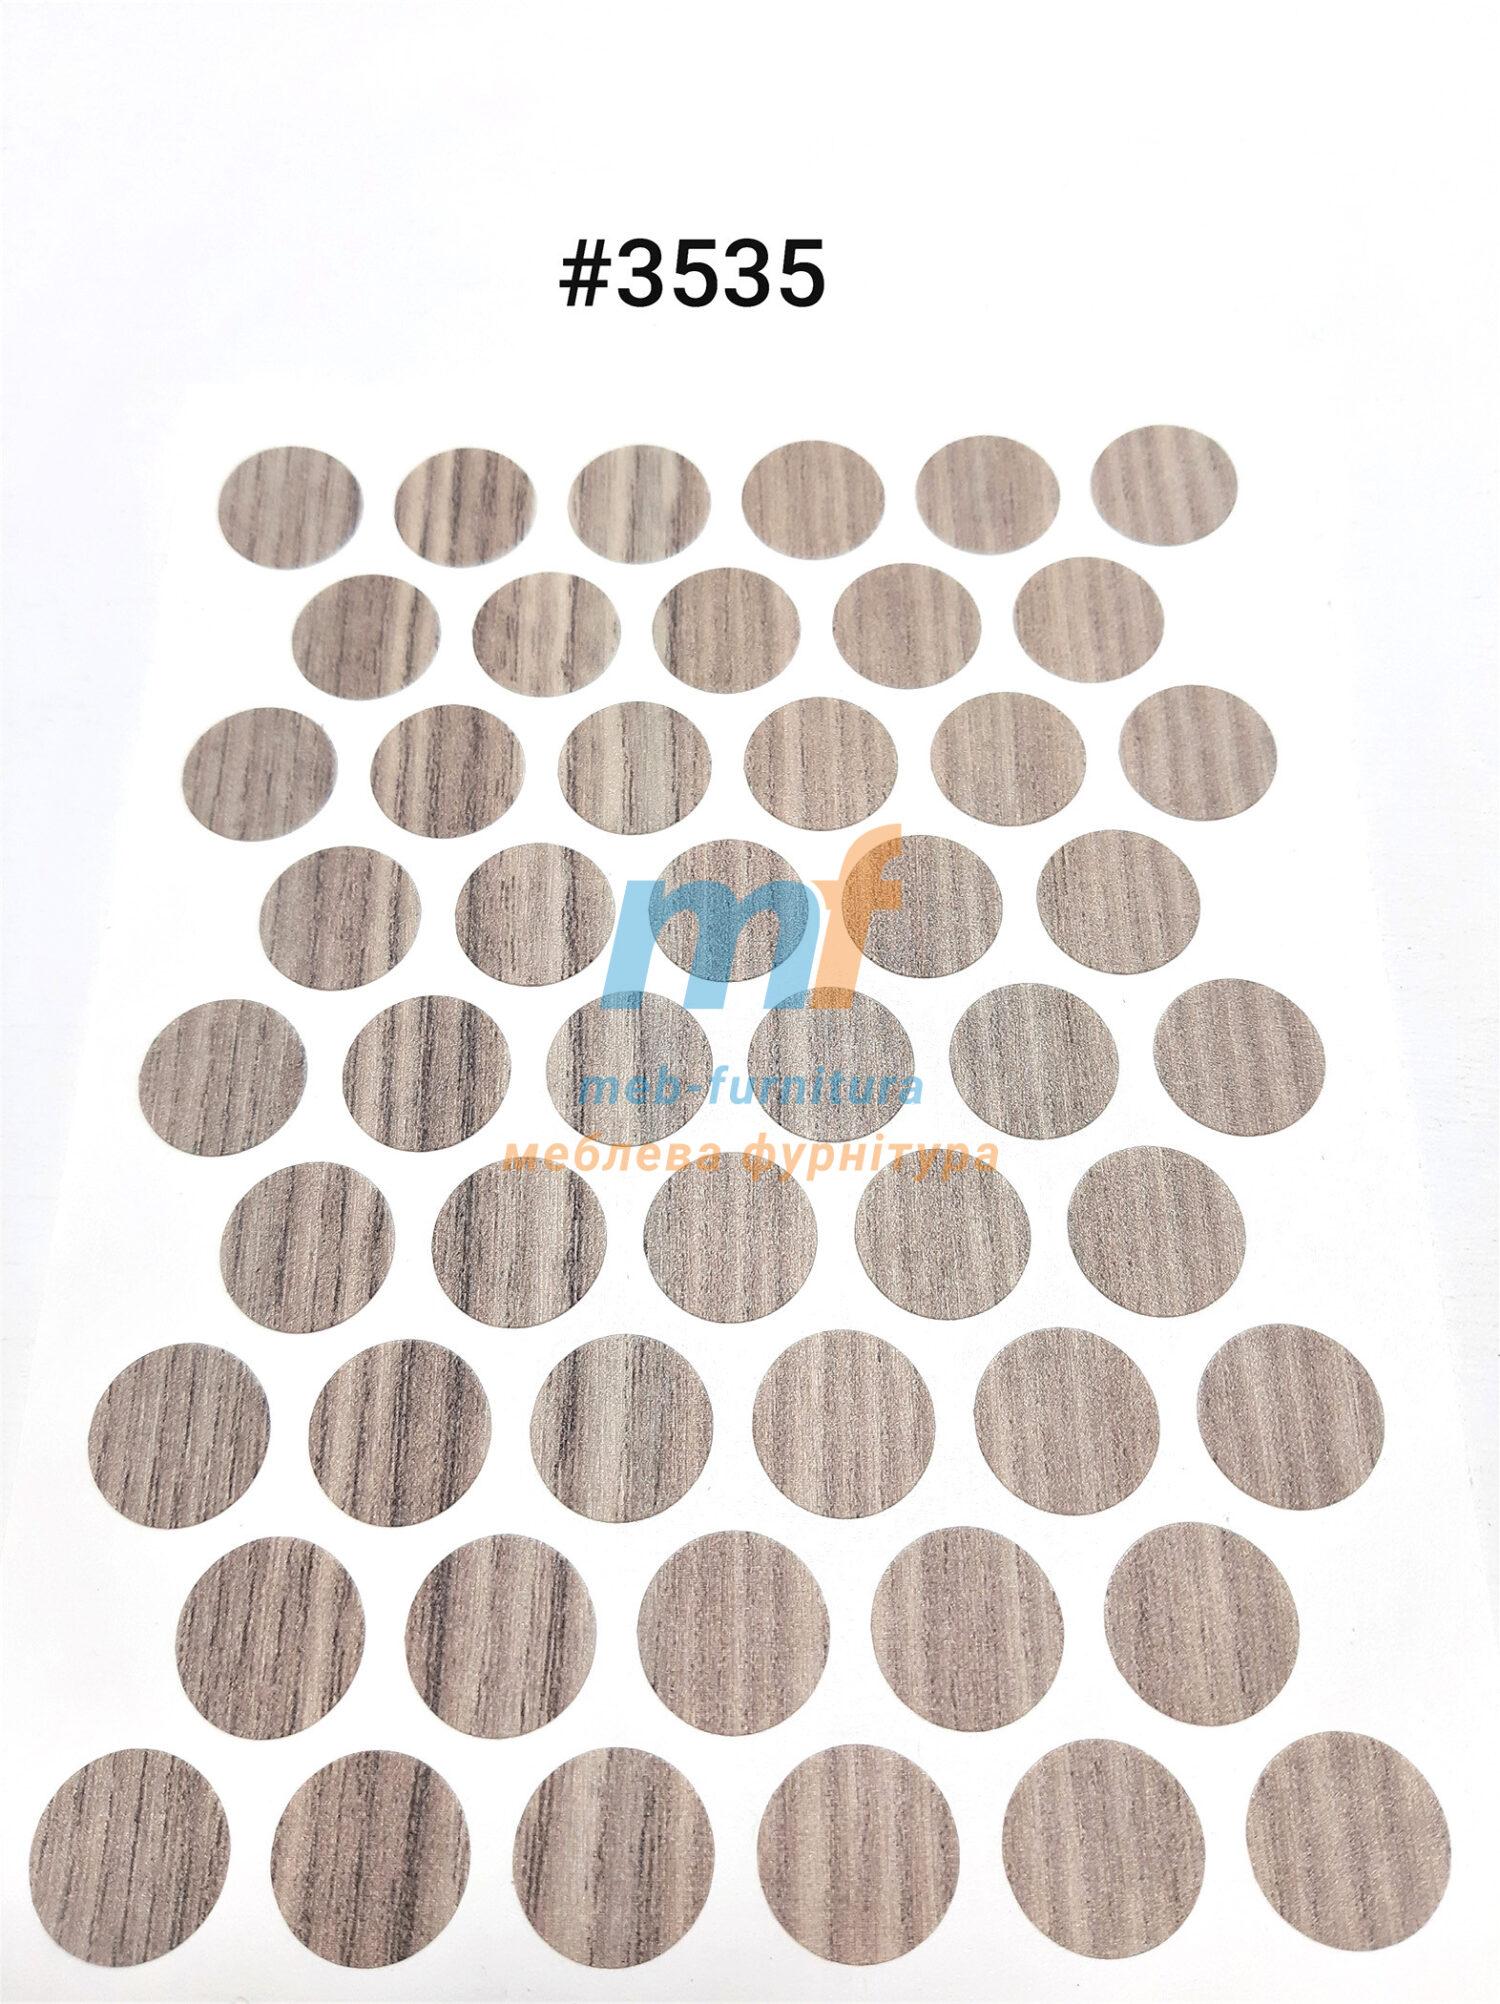 Заглушка на самоклейке для конфирмата,шурупа (3535)